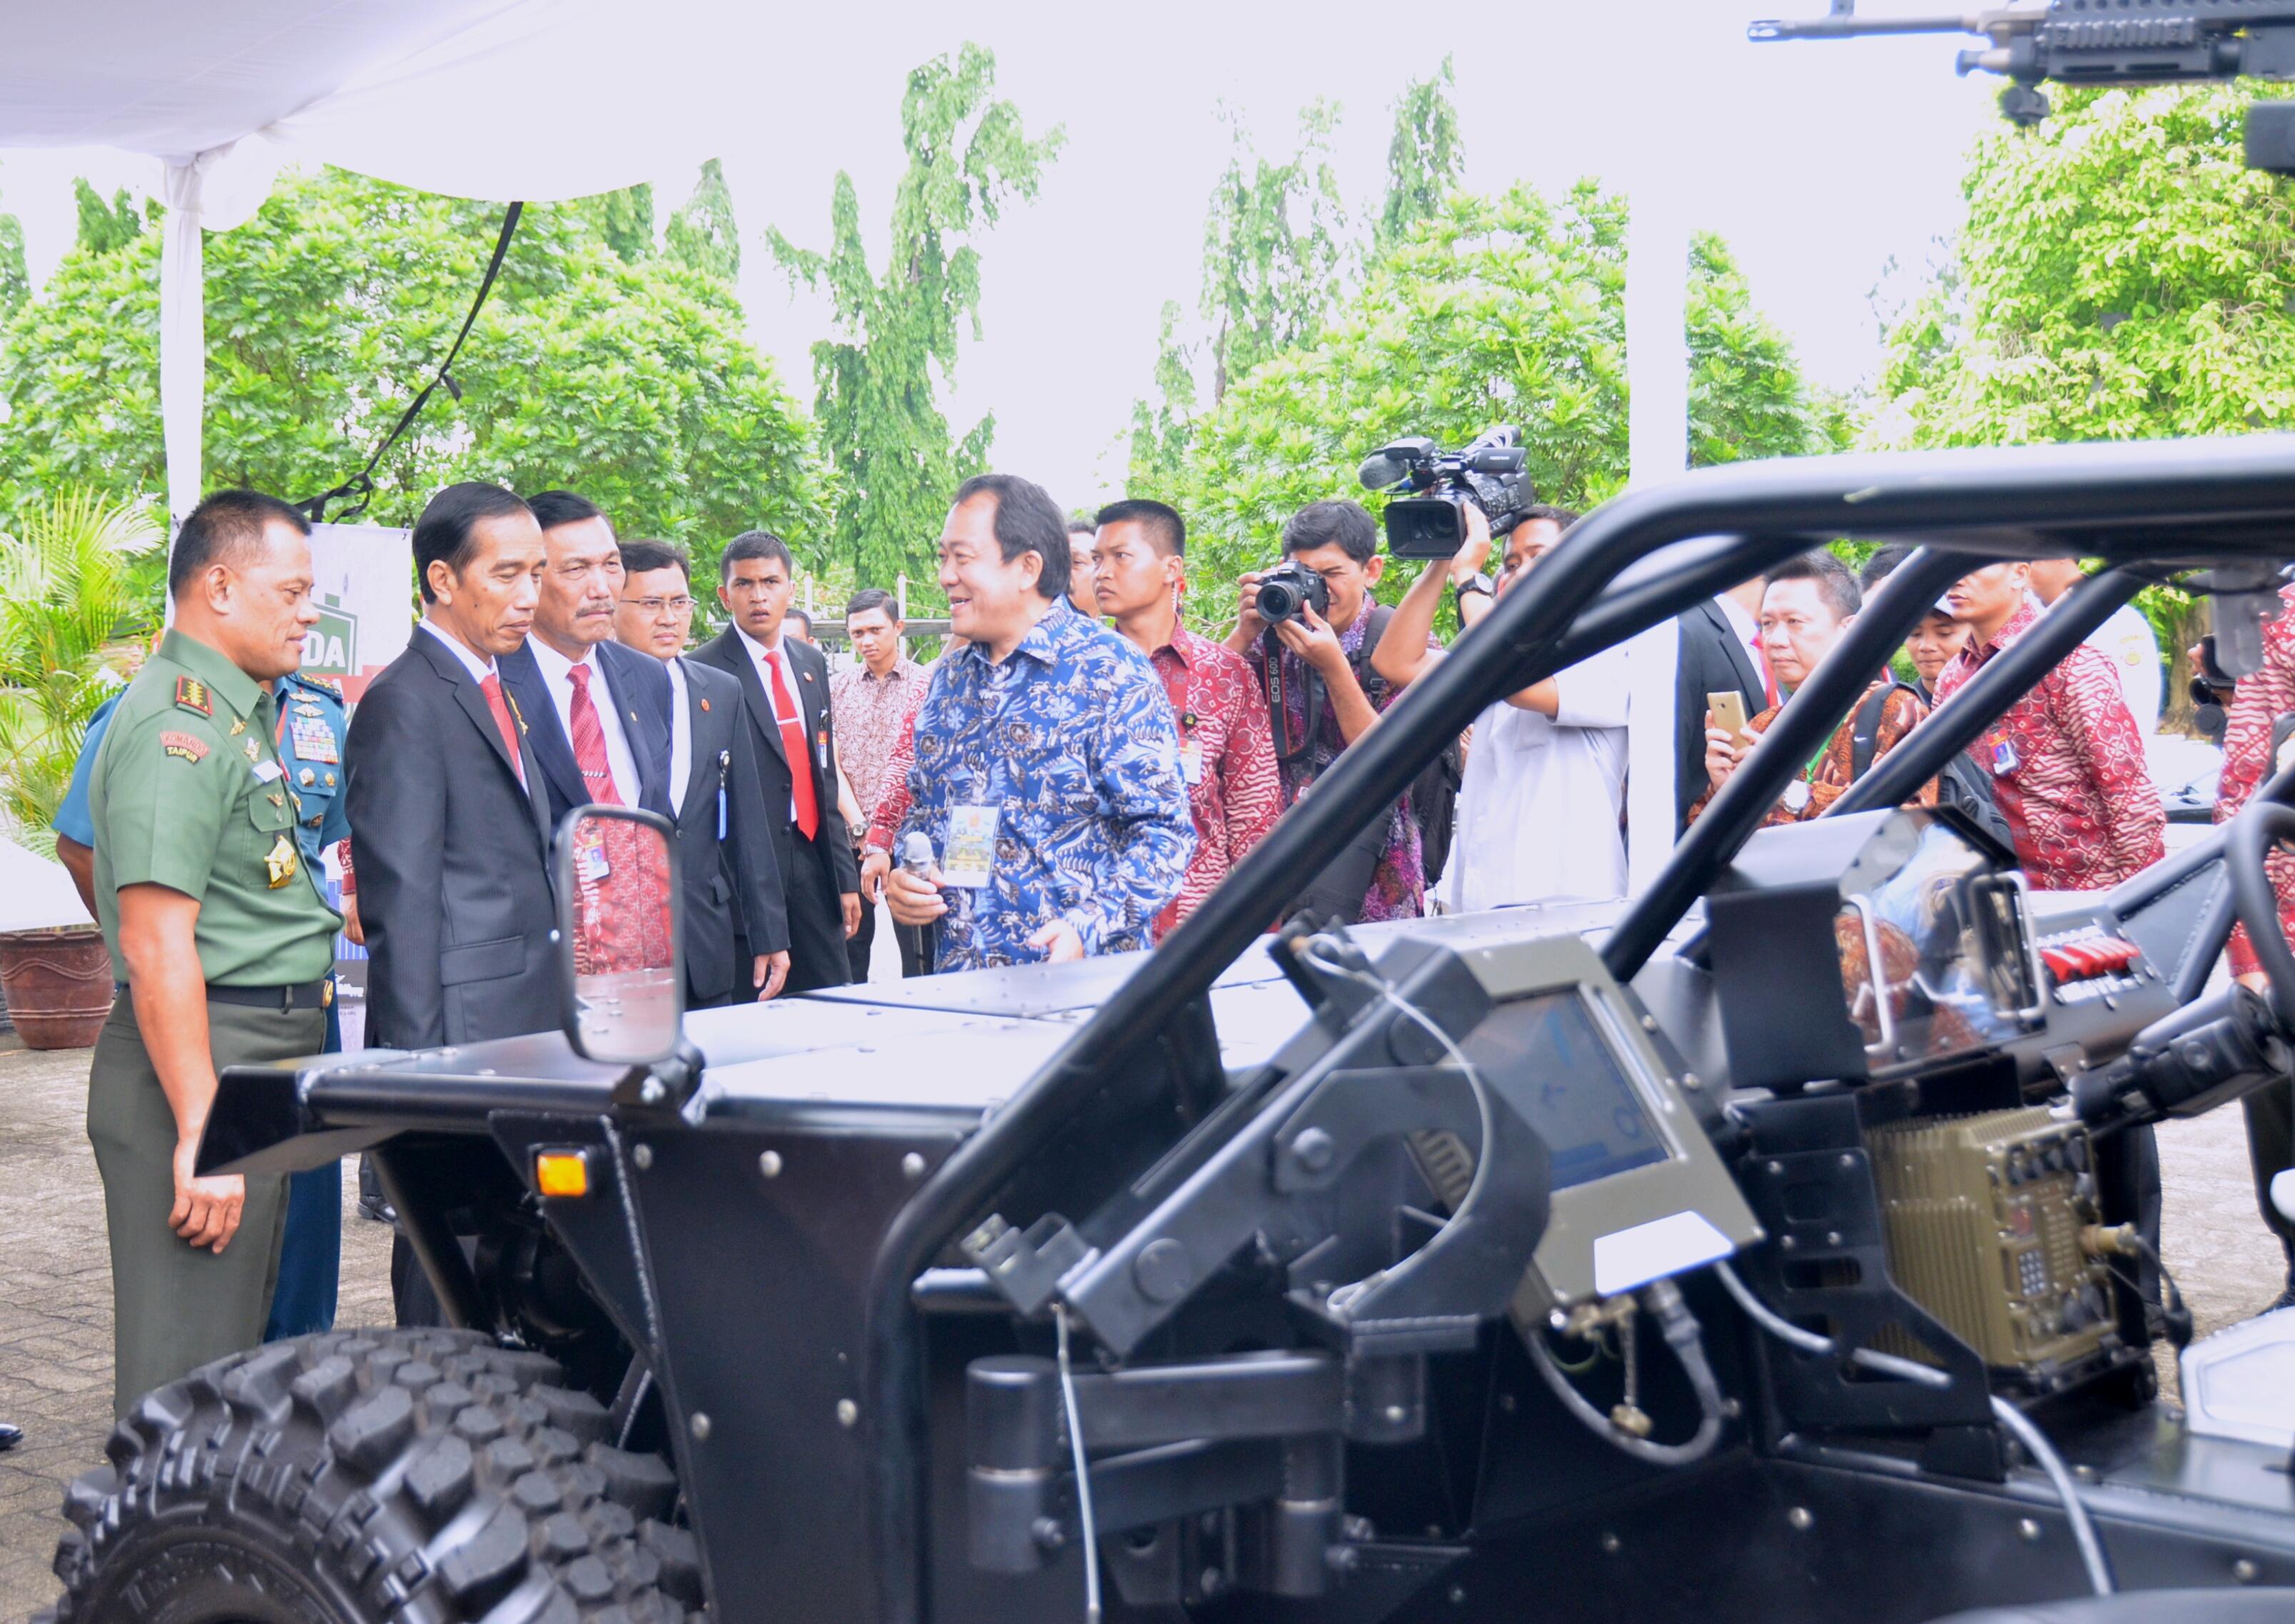 Presiden Jokowi didampingi Menko Polhukam dan Panglima TNI menyaksikan kendaraan yang digunakan TNI, di Mabes TNI, Cilangkap, Jakarta, Rabu (16/12)